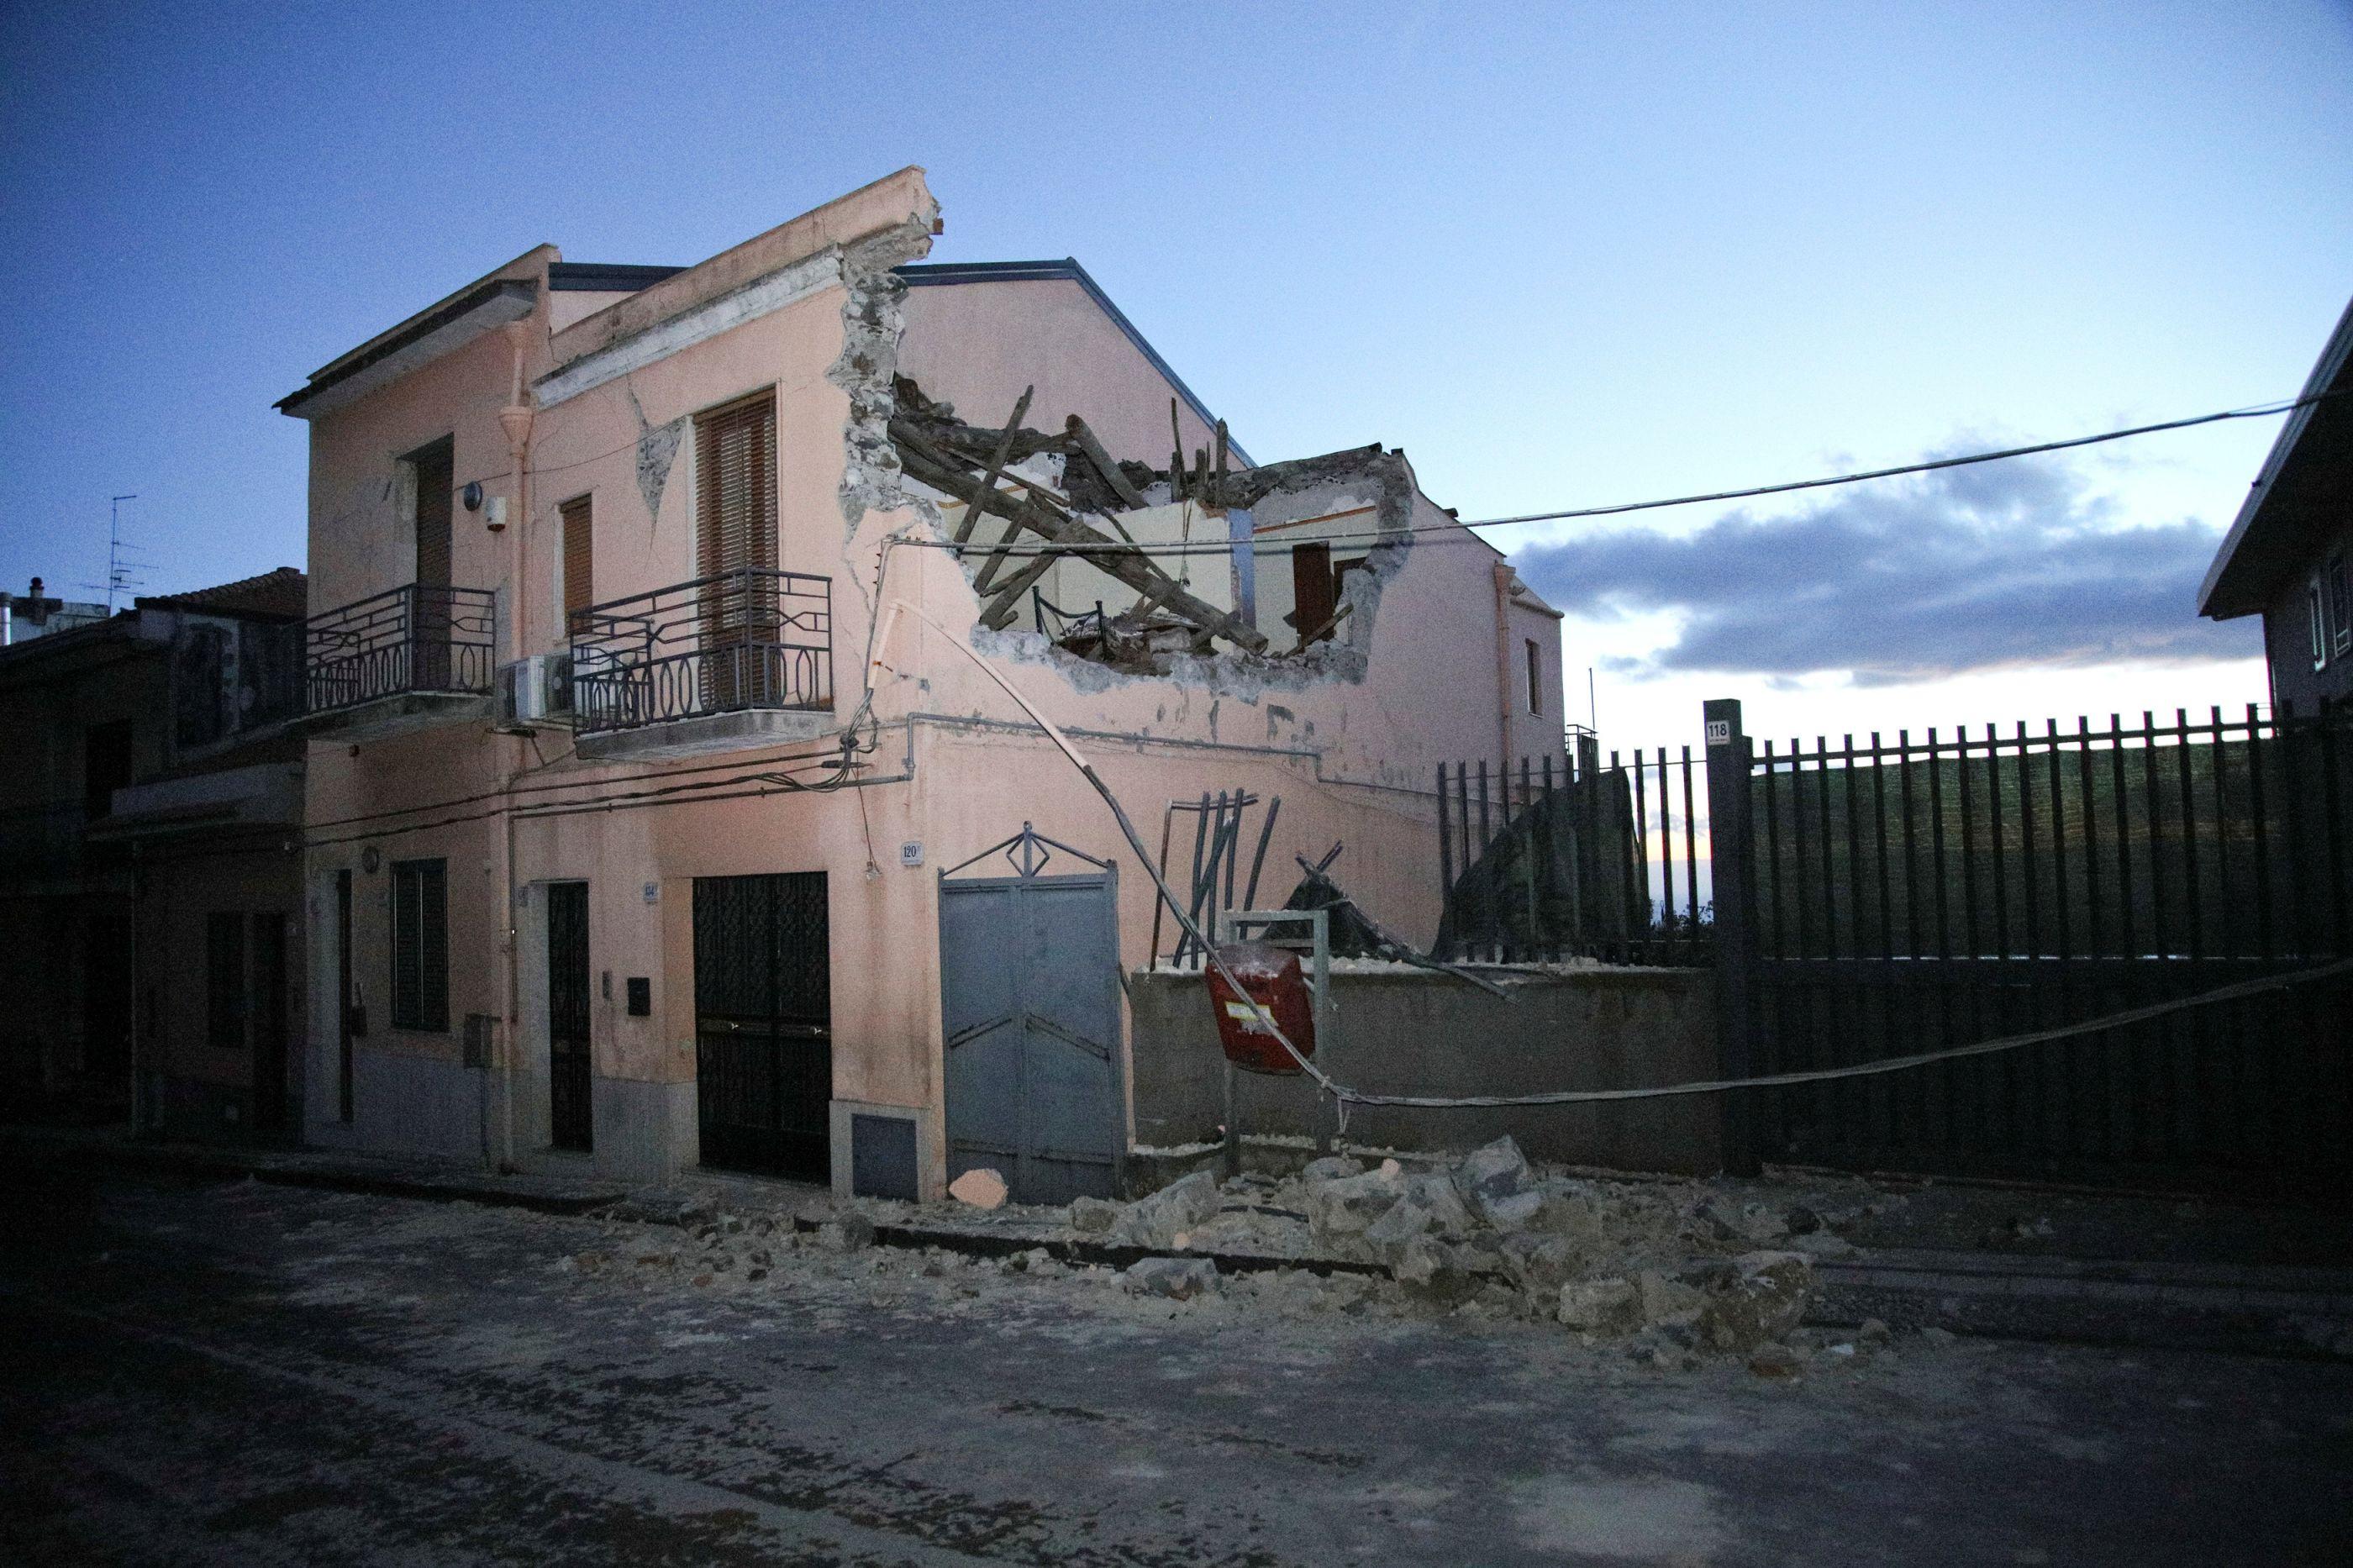 Sismo de magnitude 6,9 no sul das Filipinas. Alerta tsunami cancelado